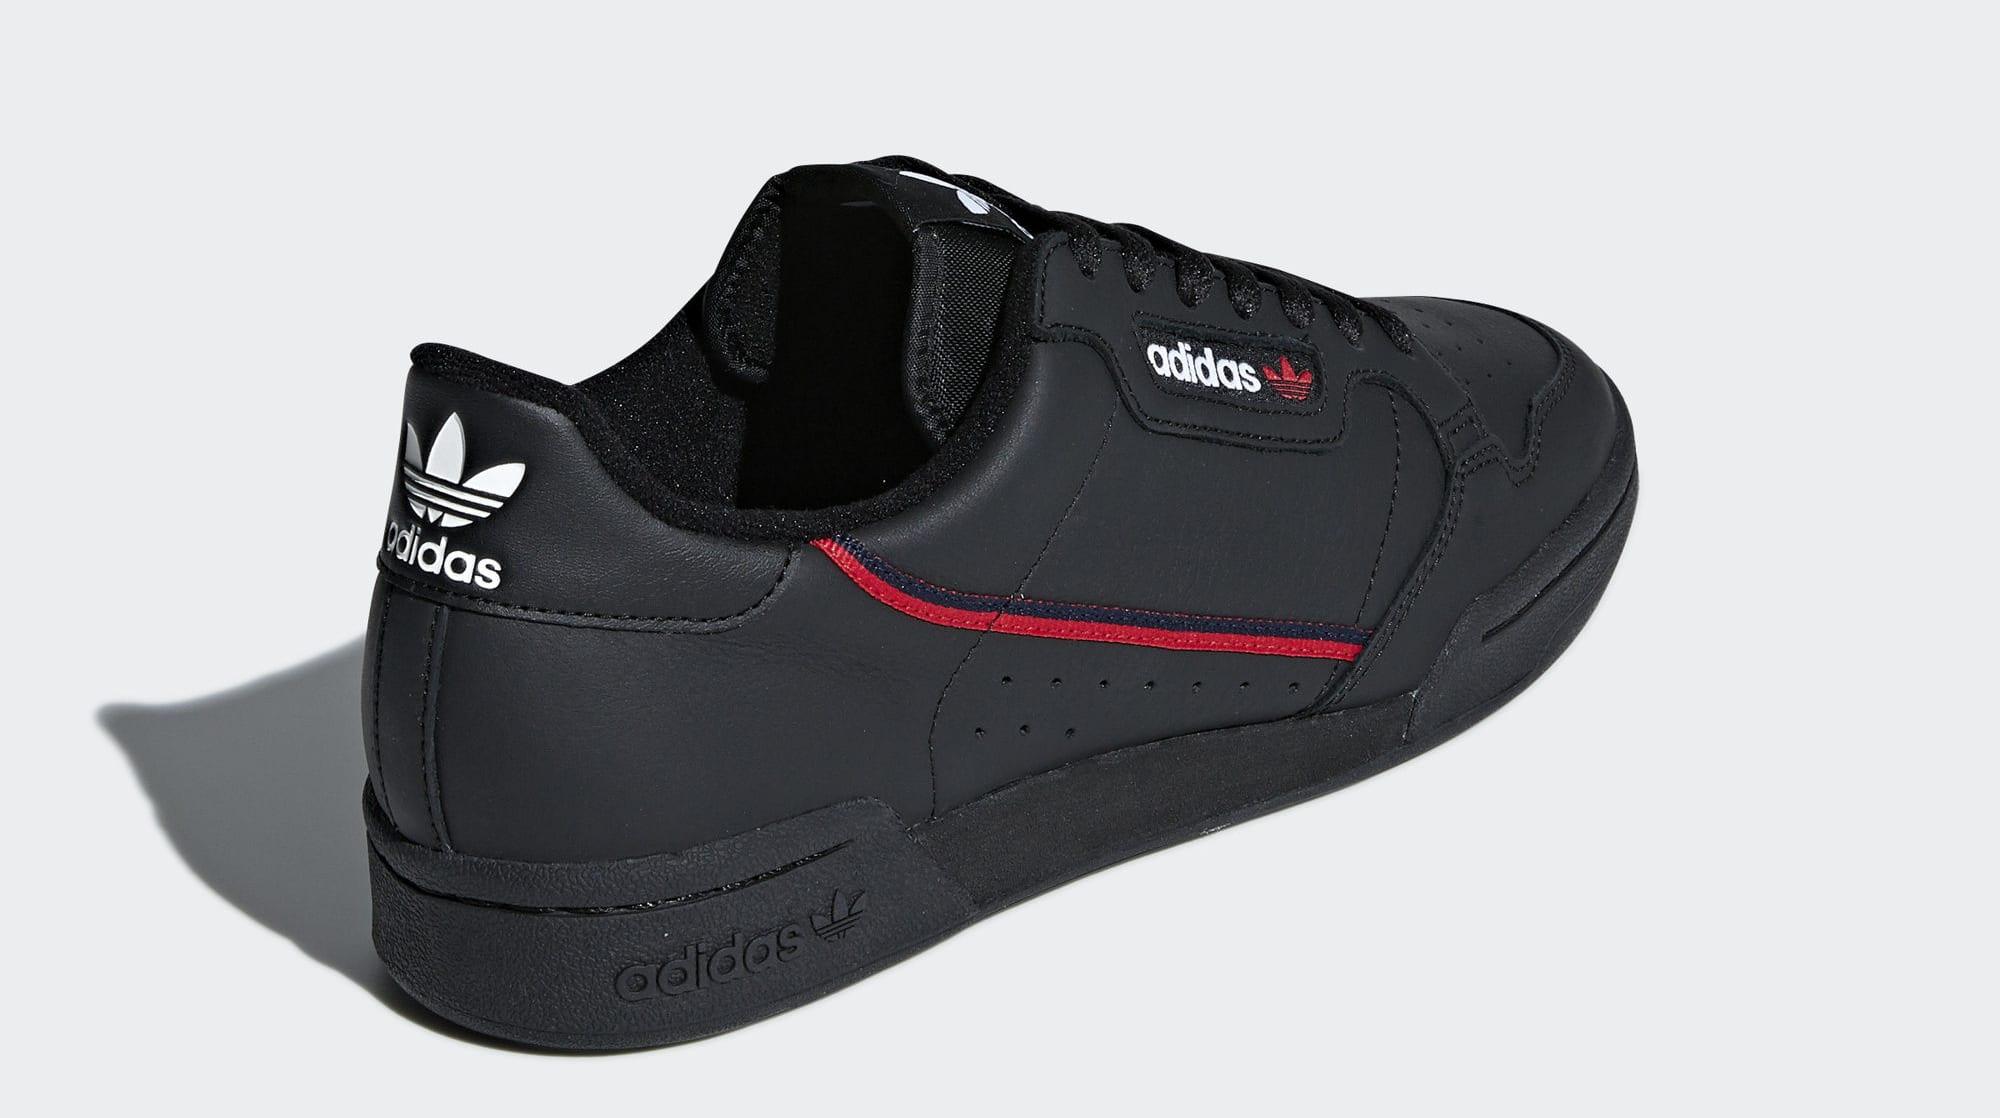 Adidas Continental 80 Rascal 'Black' B41672 (Back)